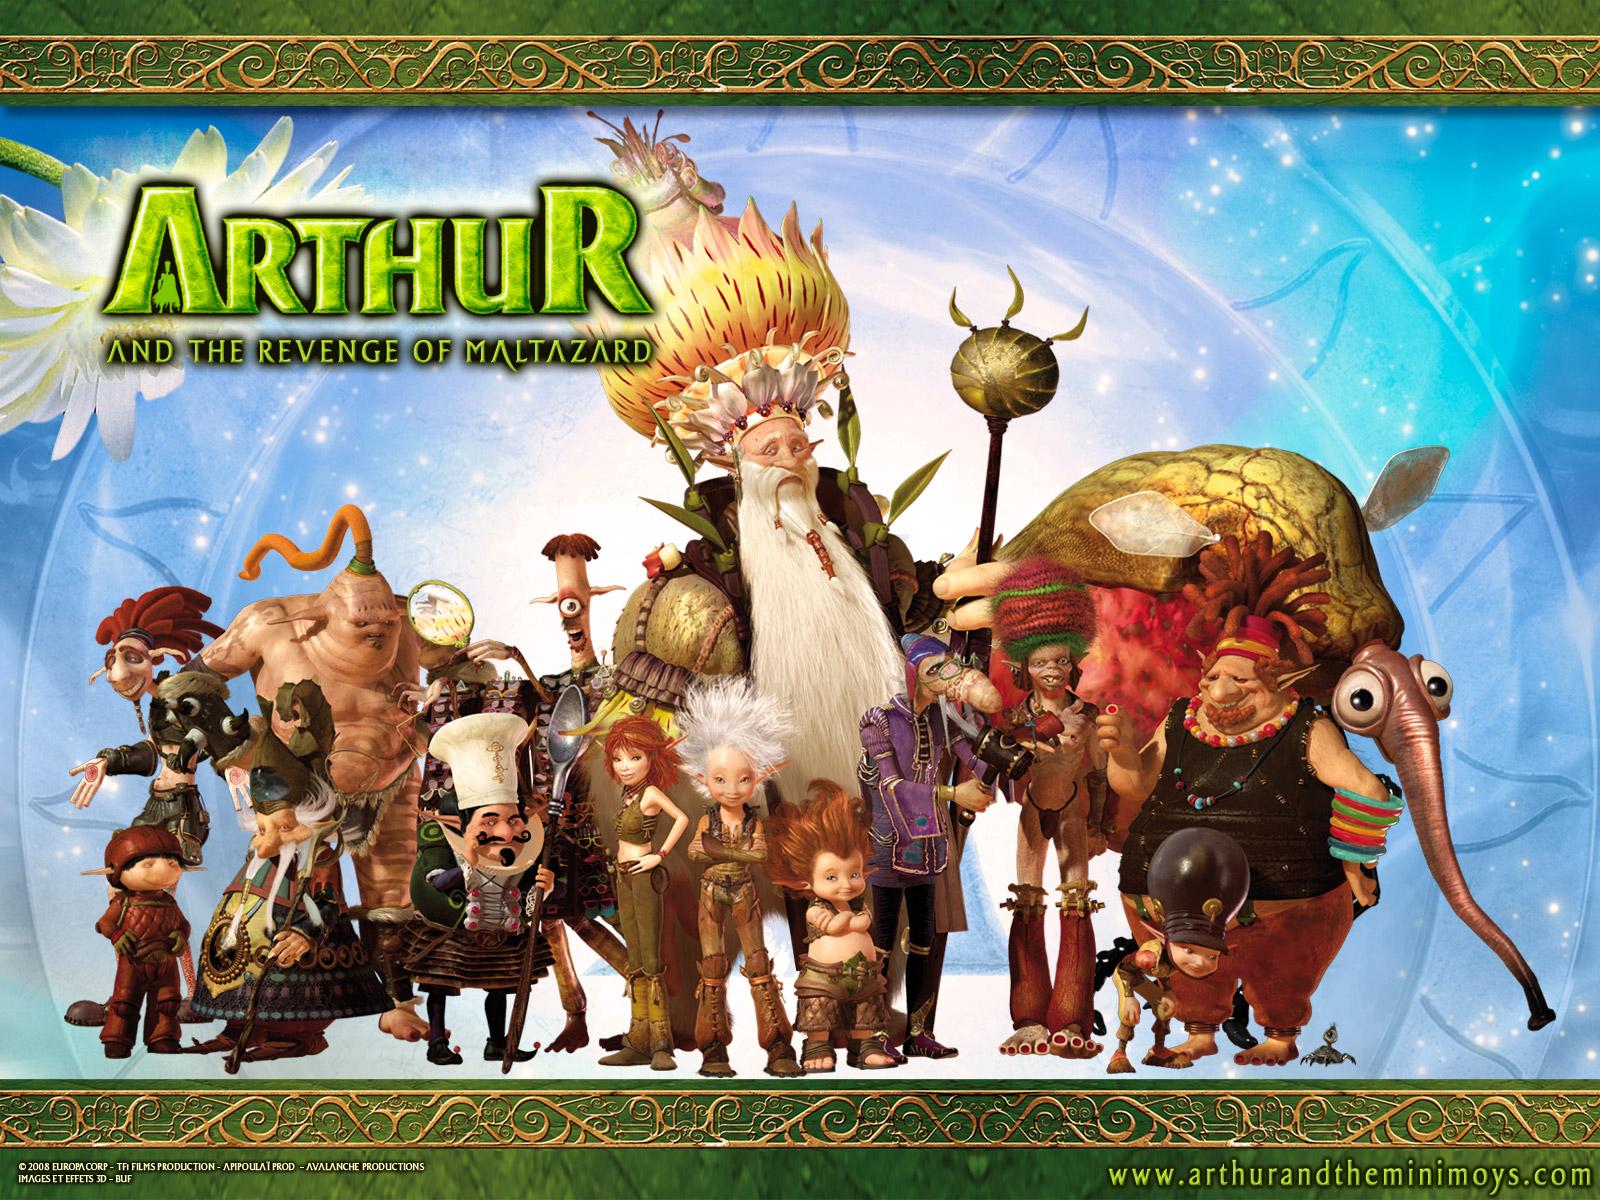 Arthur And The Revenge Of Maltazard Backgrounds on Wallpapers Vista